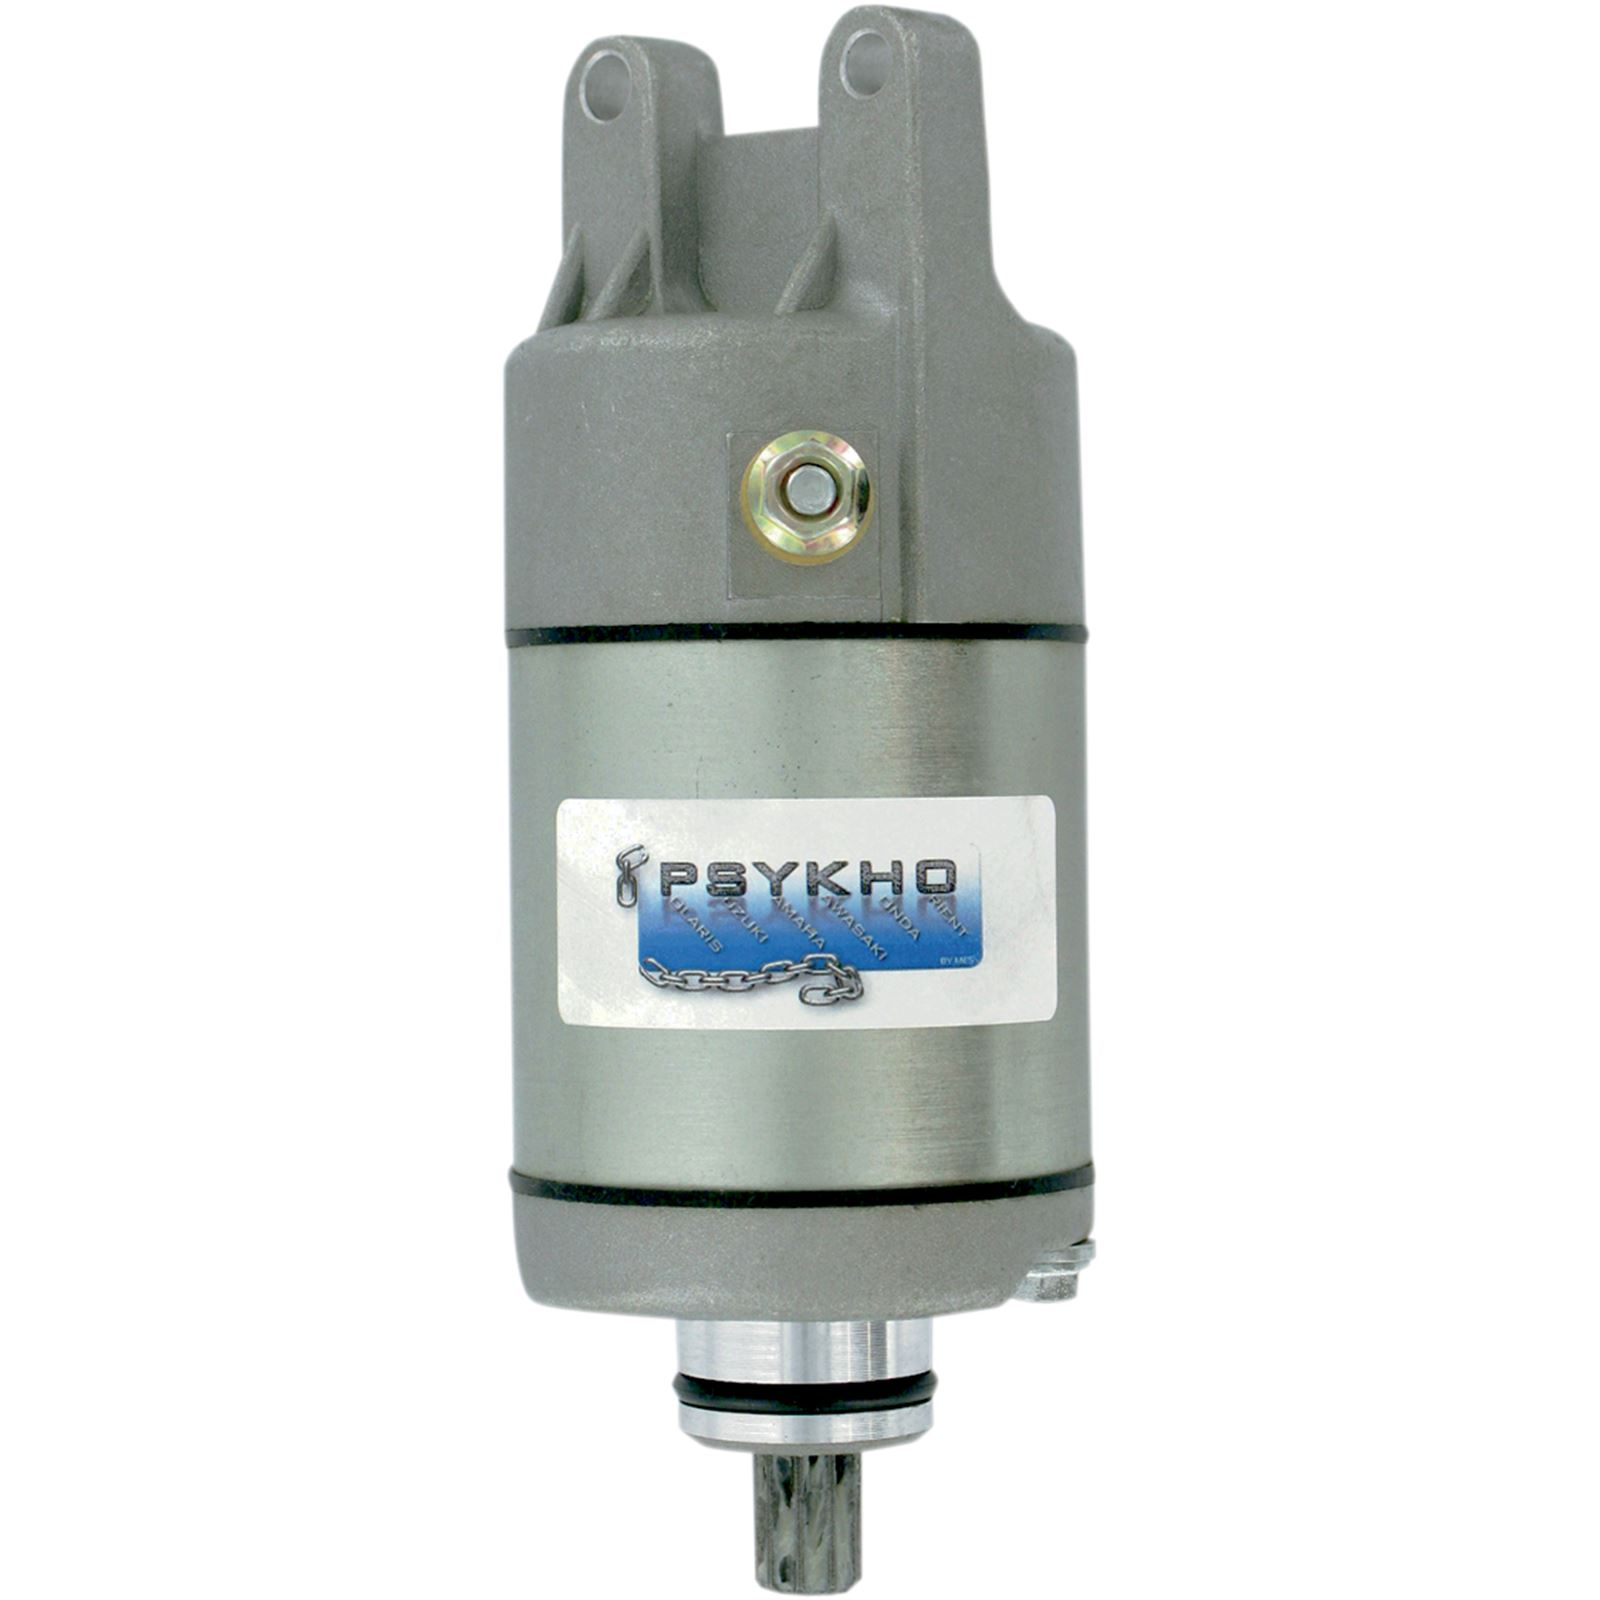 Psykho Starter - TRX350 S/S